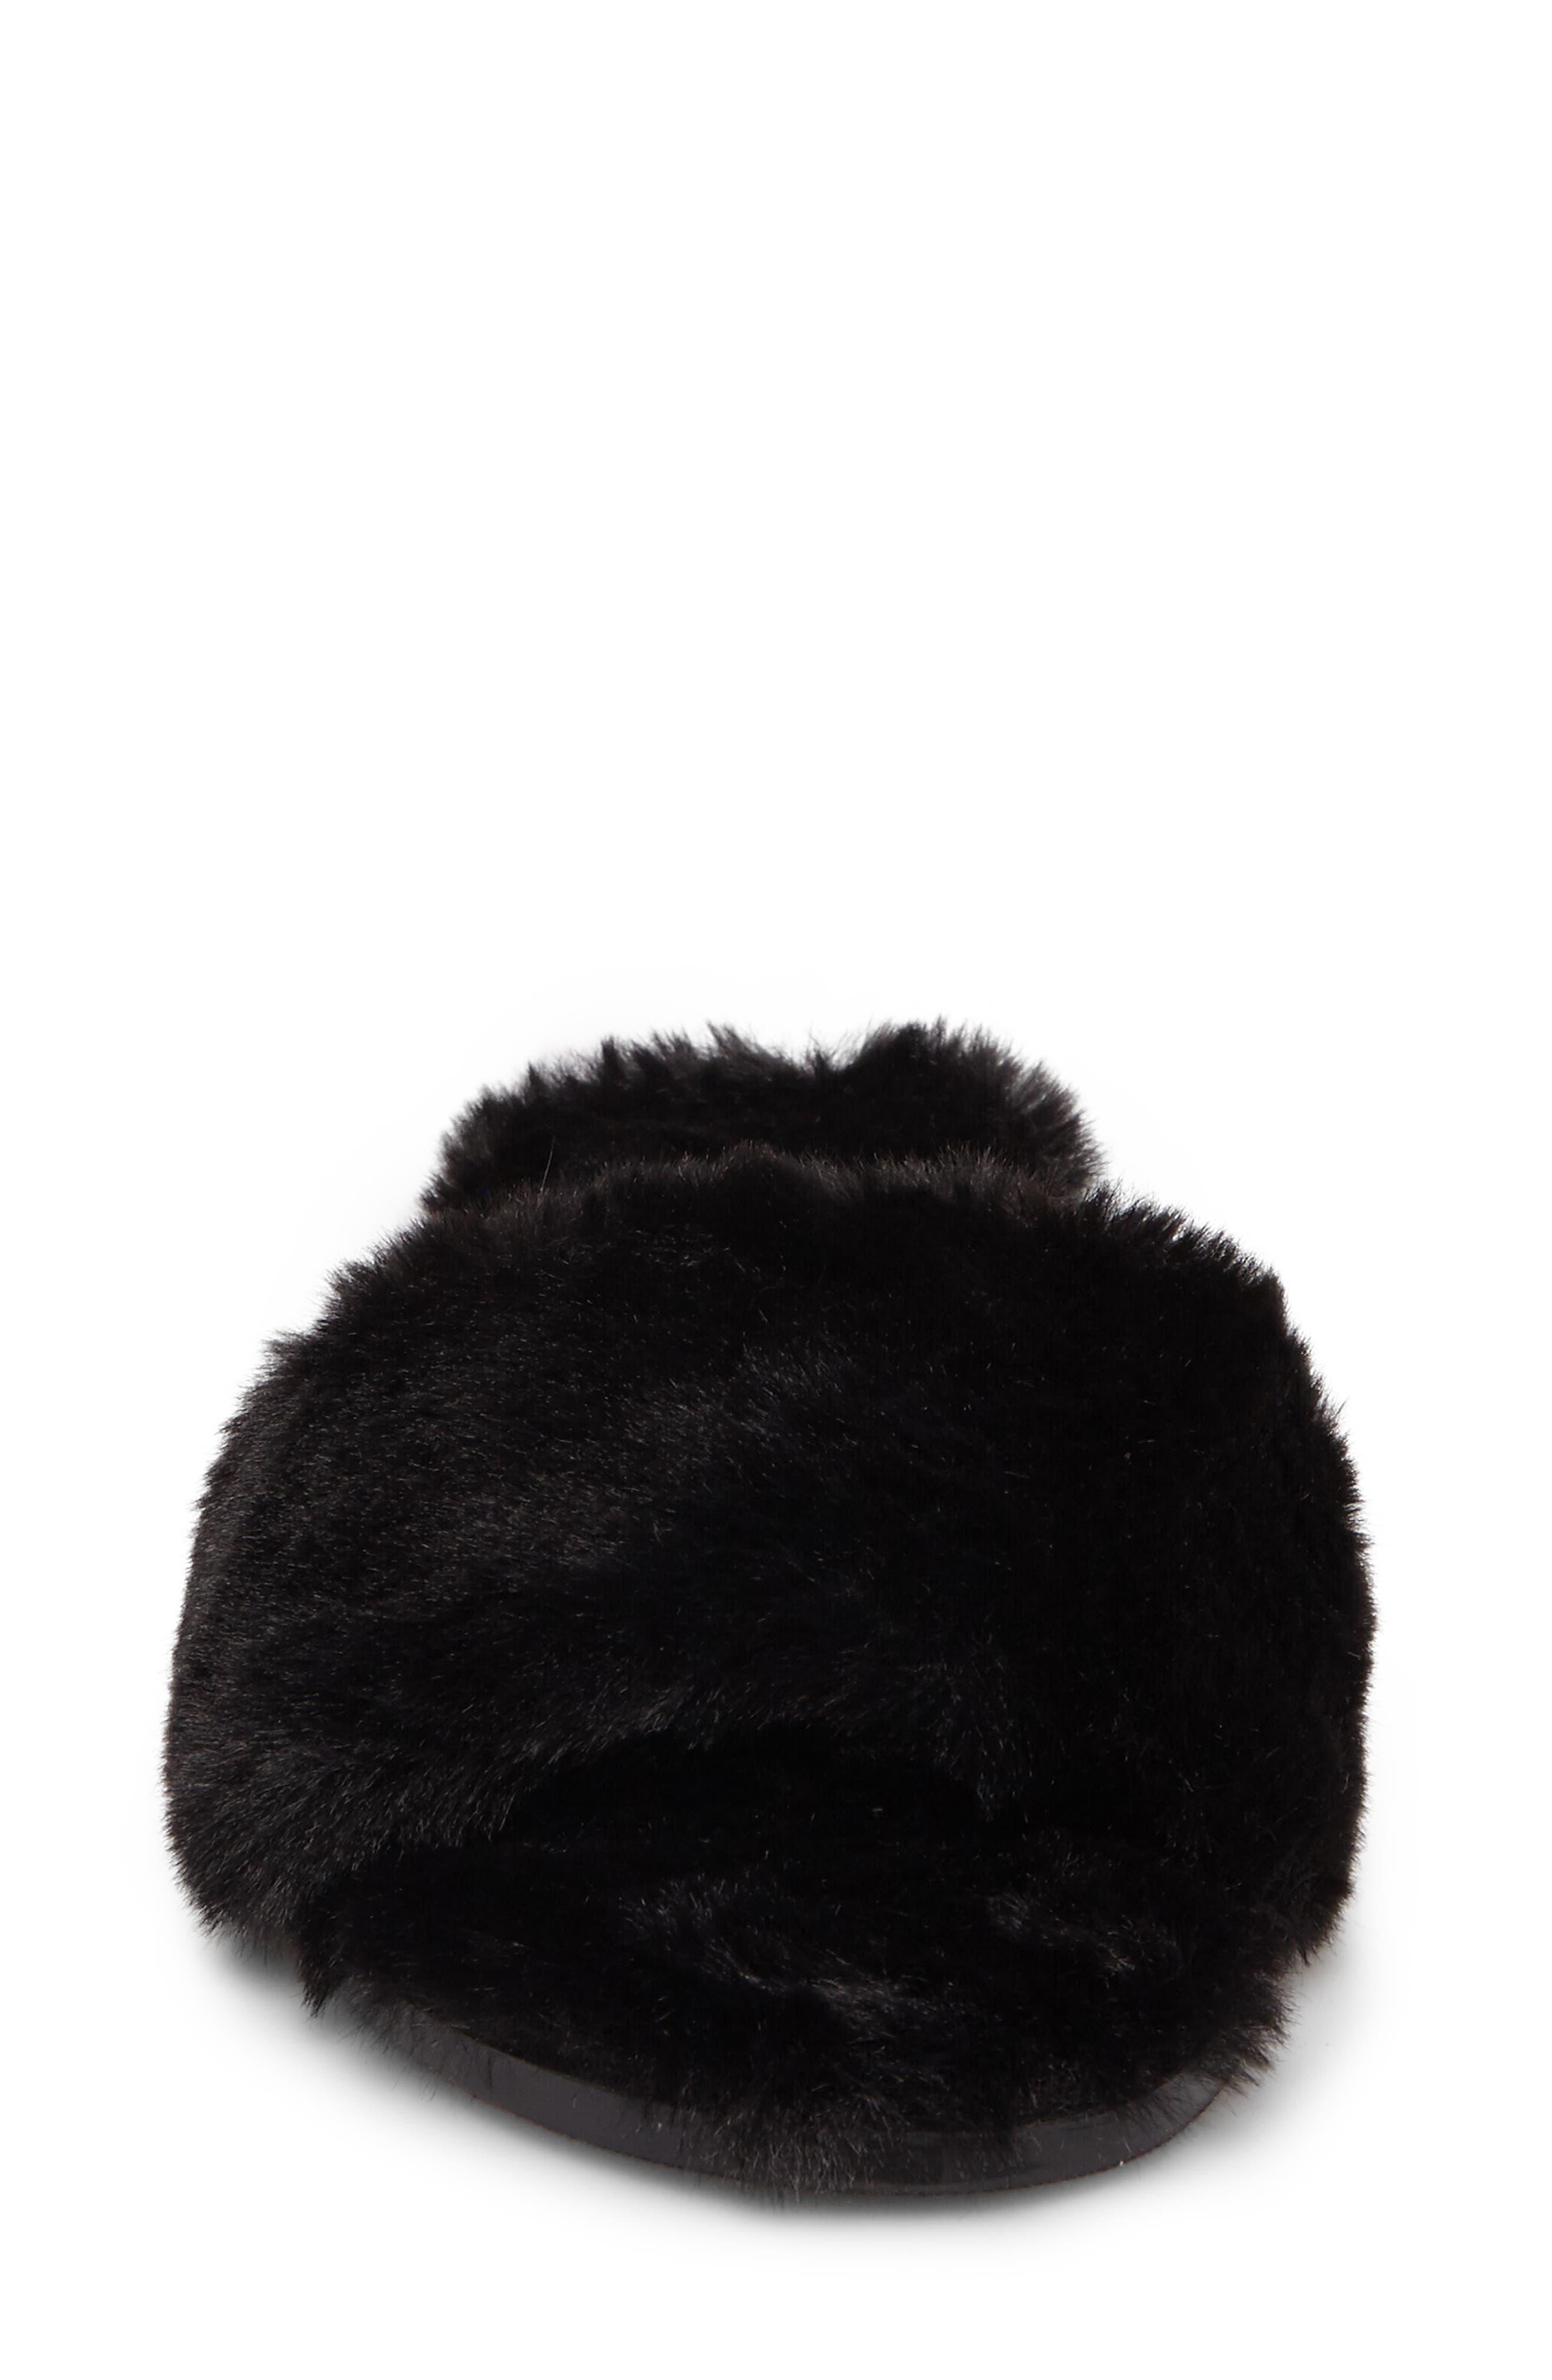 Mulholland Faux Fur Slide Sandal,                             Alternate thumbnail 4, color,                             001